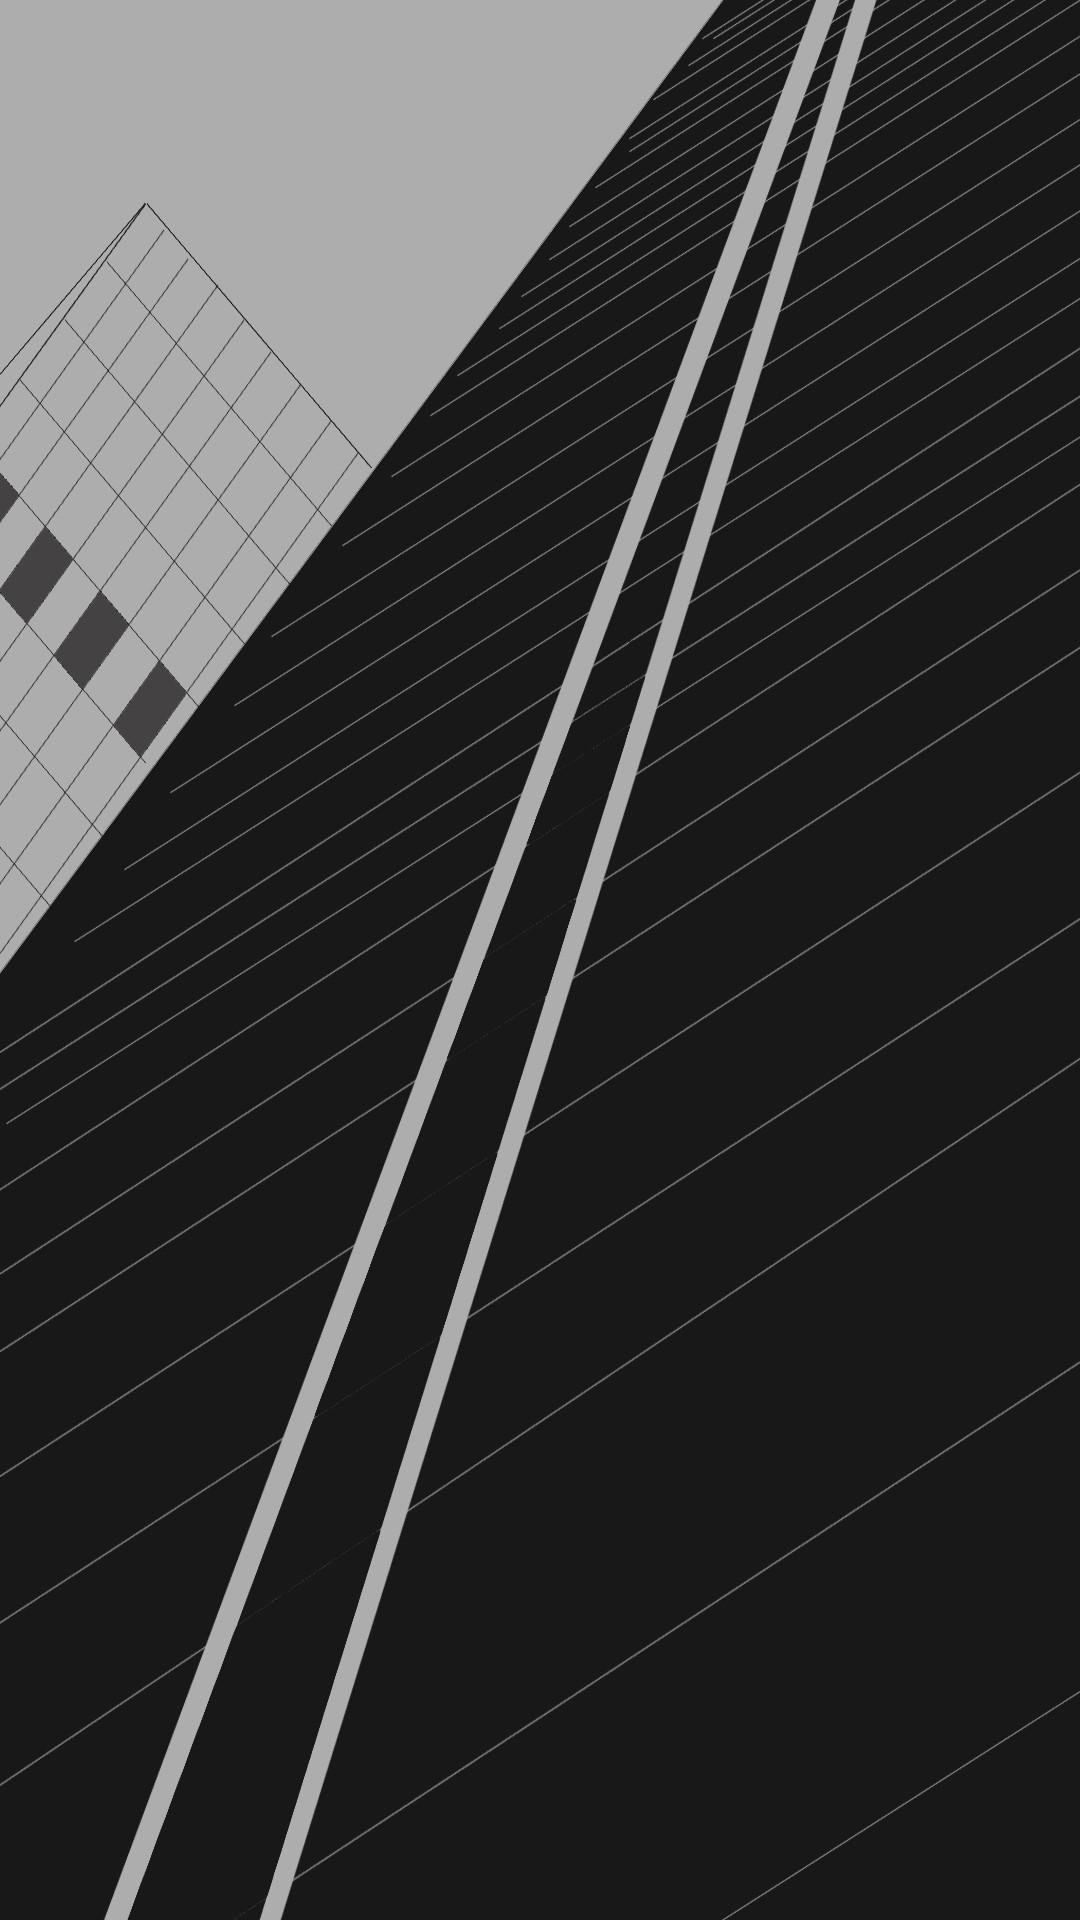 Res: 1080x1920, Geometric Wallpaper Lovely iPhone7 Geometric Wallpaper